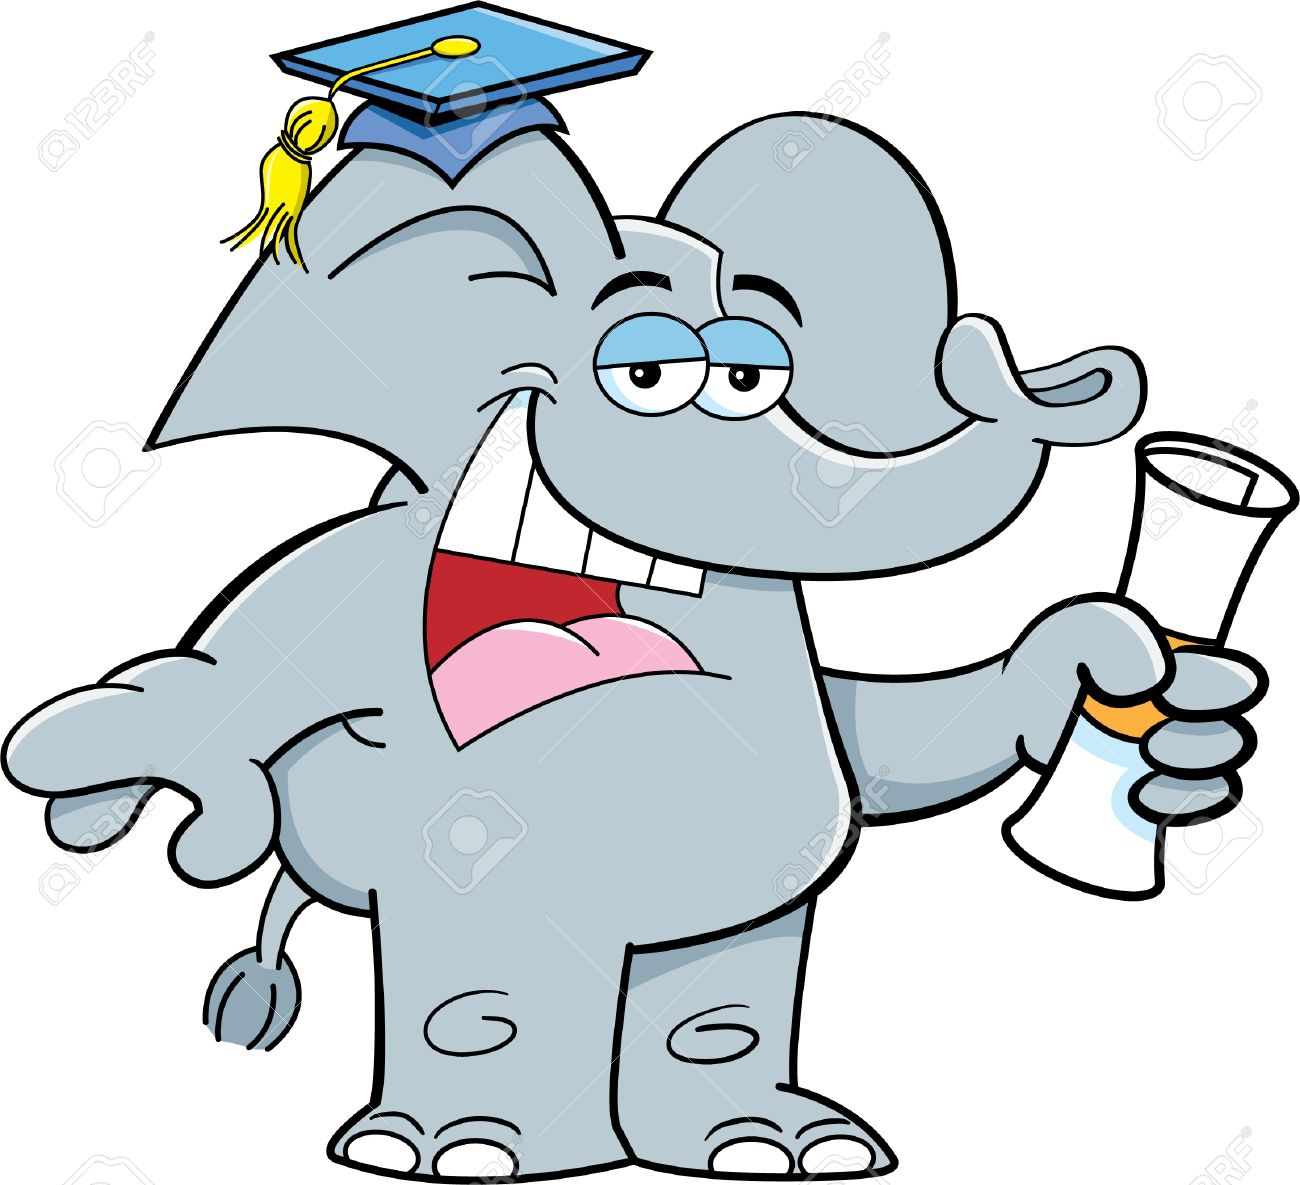 Cartoon illustration of an elephant holding a diploma Stock Vector - 18377517